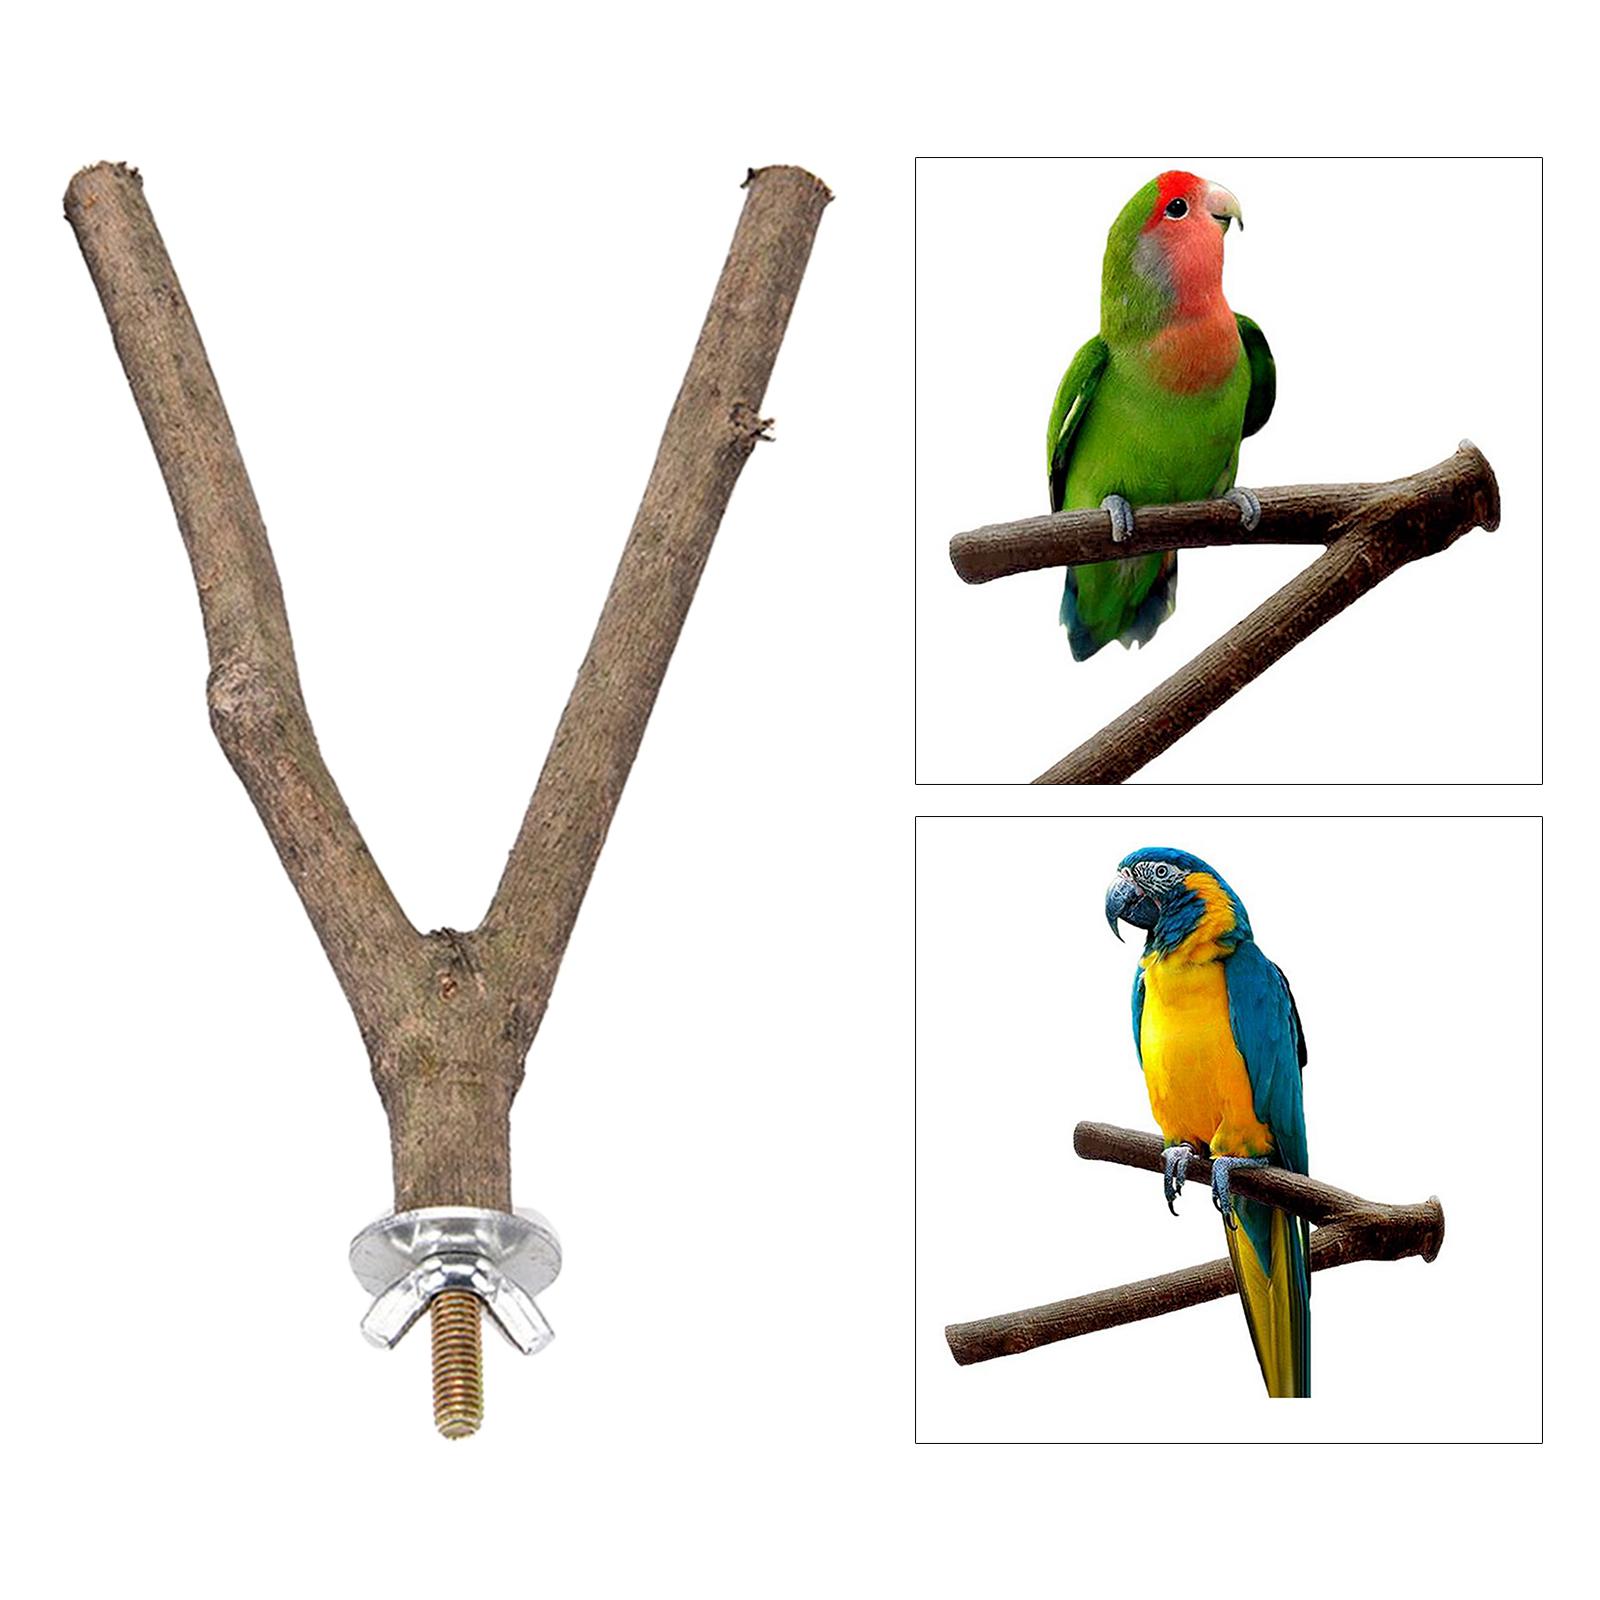 thumbnail 4 - Bird-Perch-Wood-Stand-Bird-Cage-Swing-Branch-for-Parrot-Parakeet-Cockatiel